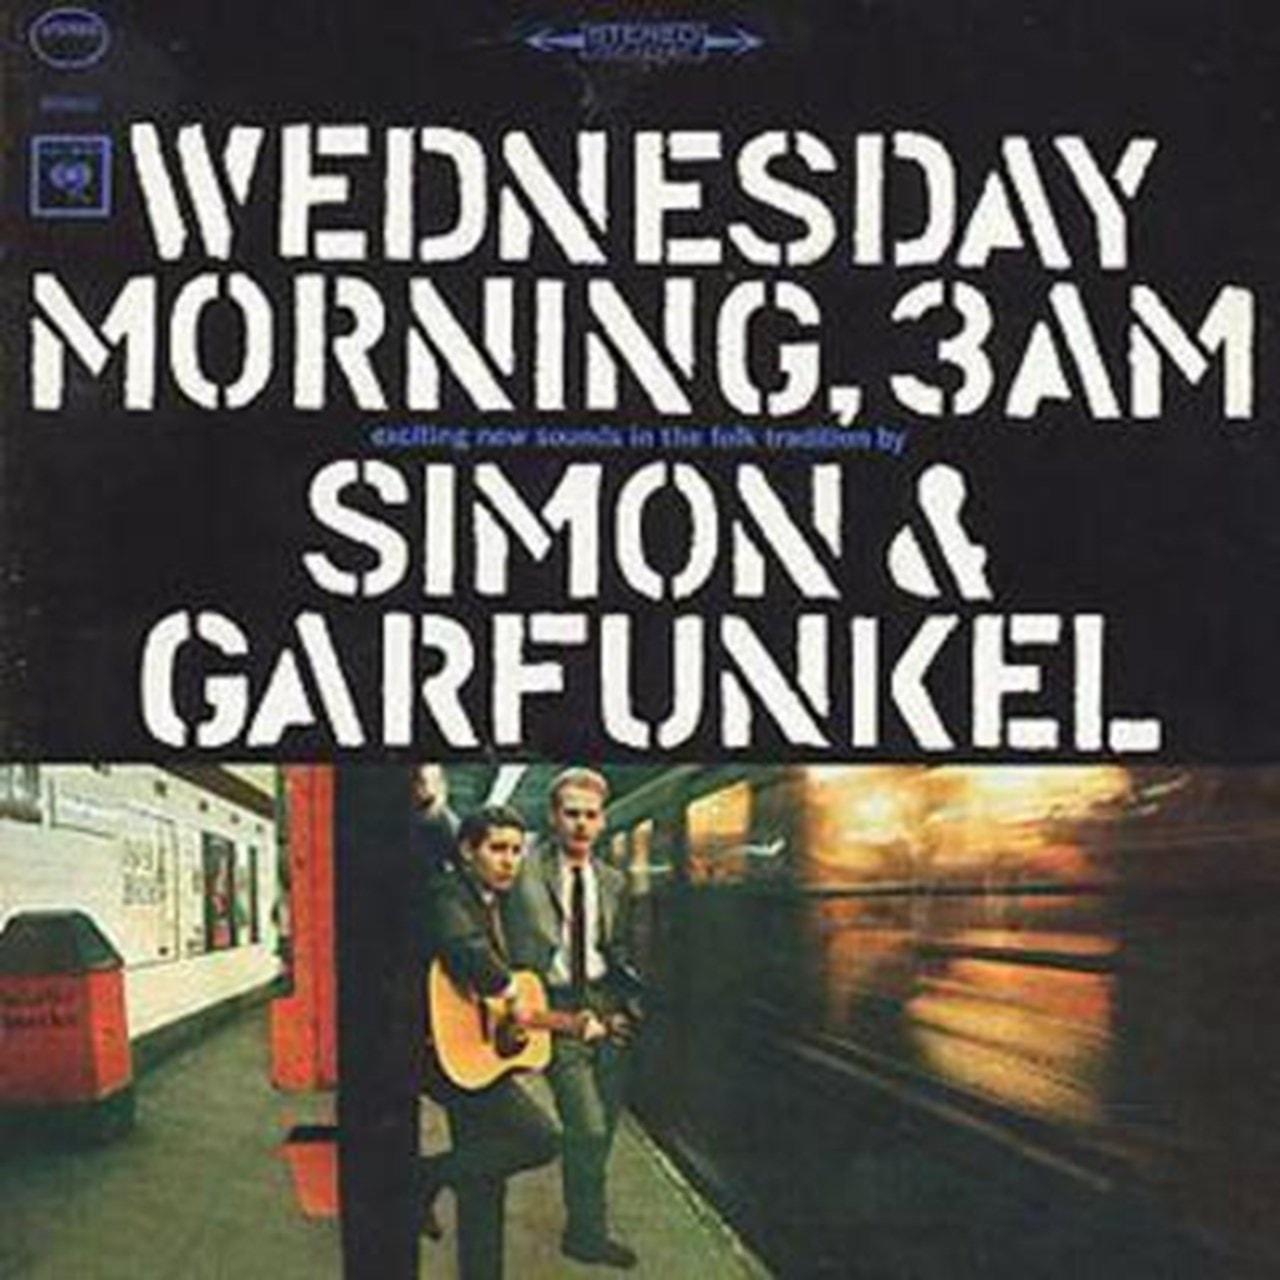 Wednesday Morning, 3am - 1